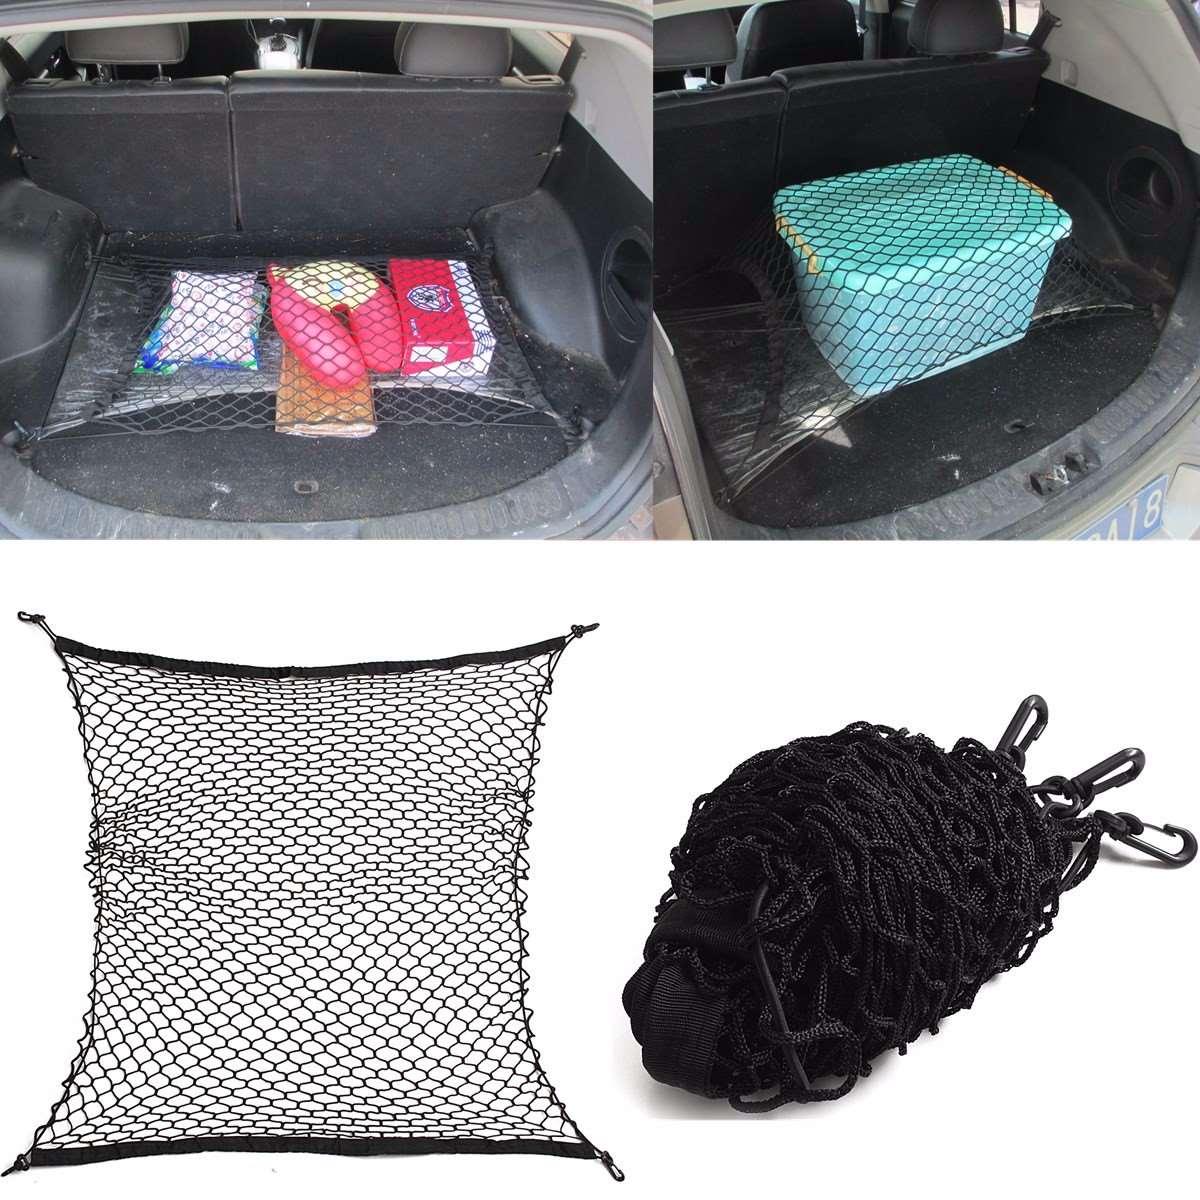 100x100cm Universal Car Seat Back Storage Mesh Net Rear Cargo Trunk Storage Organizer Luggage Swing Mesh Nets Holder